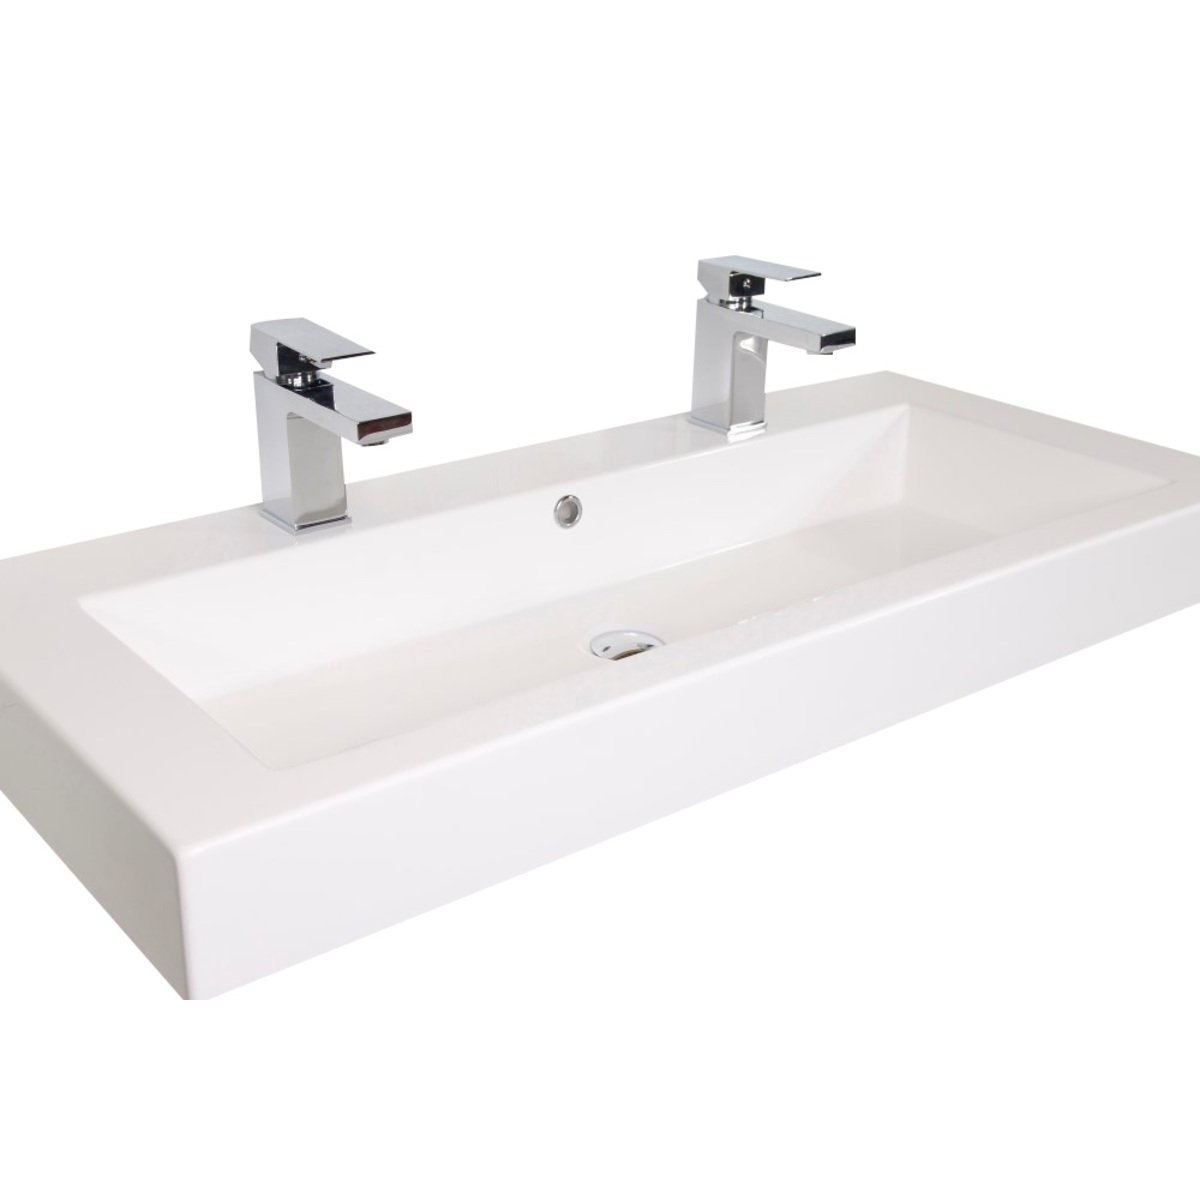 Vasque Avec 2 Robinets | Parawall Site encequiconcerne Vasque 100 Cm 2 Robinets